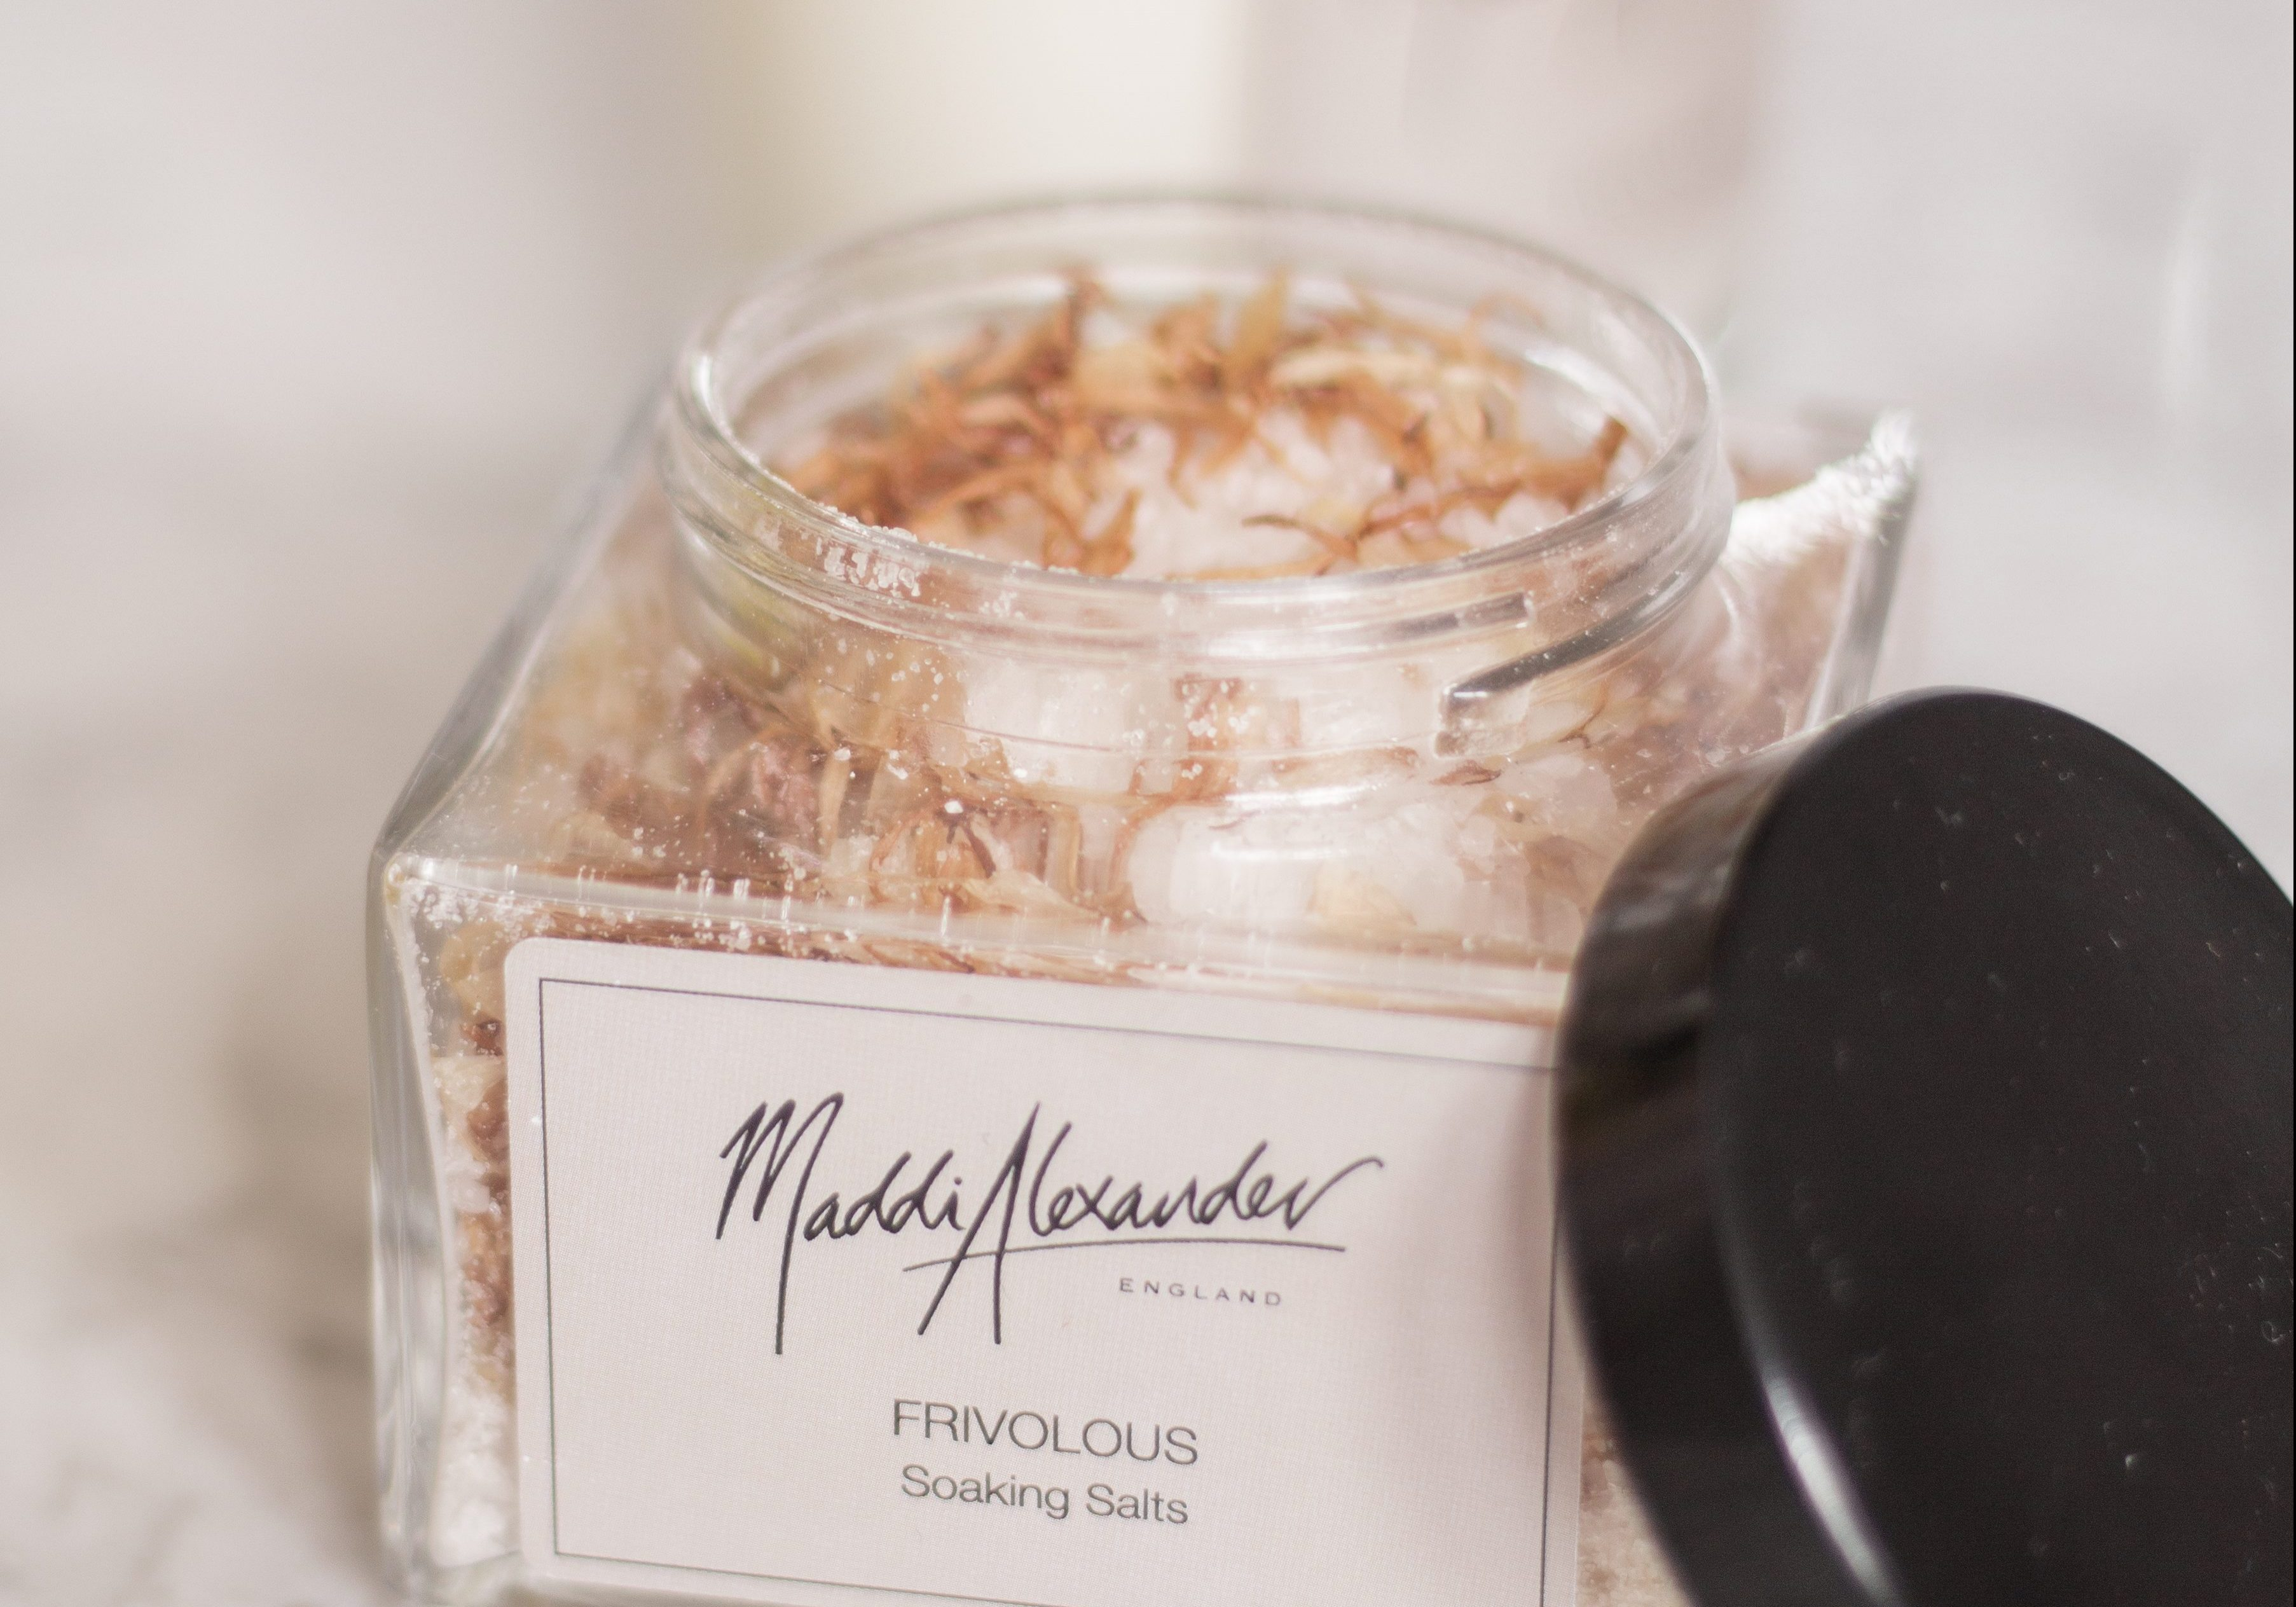 Maddi Alexander Frivolous Soaking Salts Mothers Day Gift Ideas